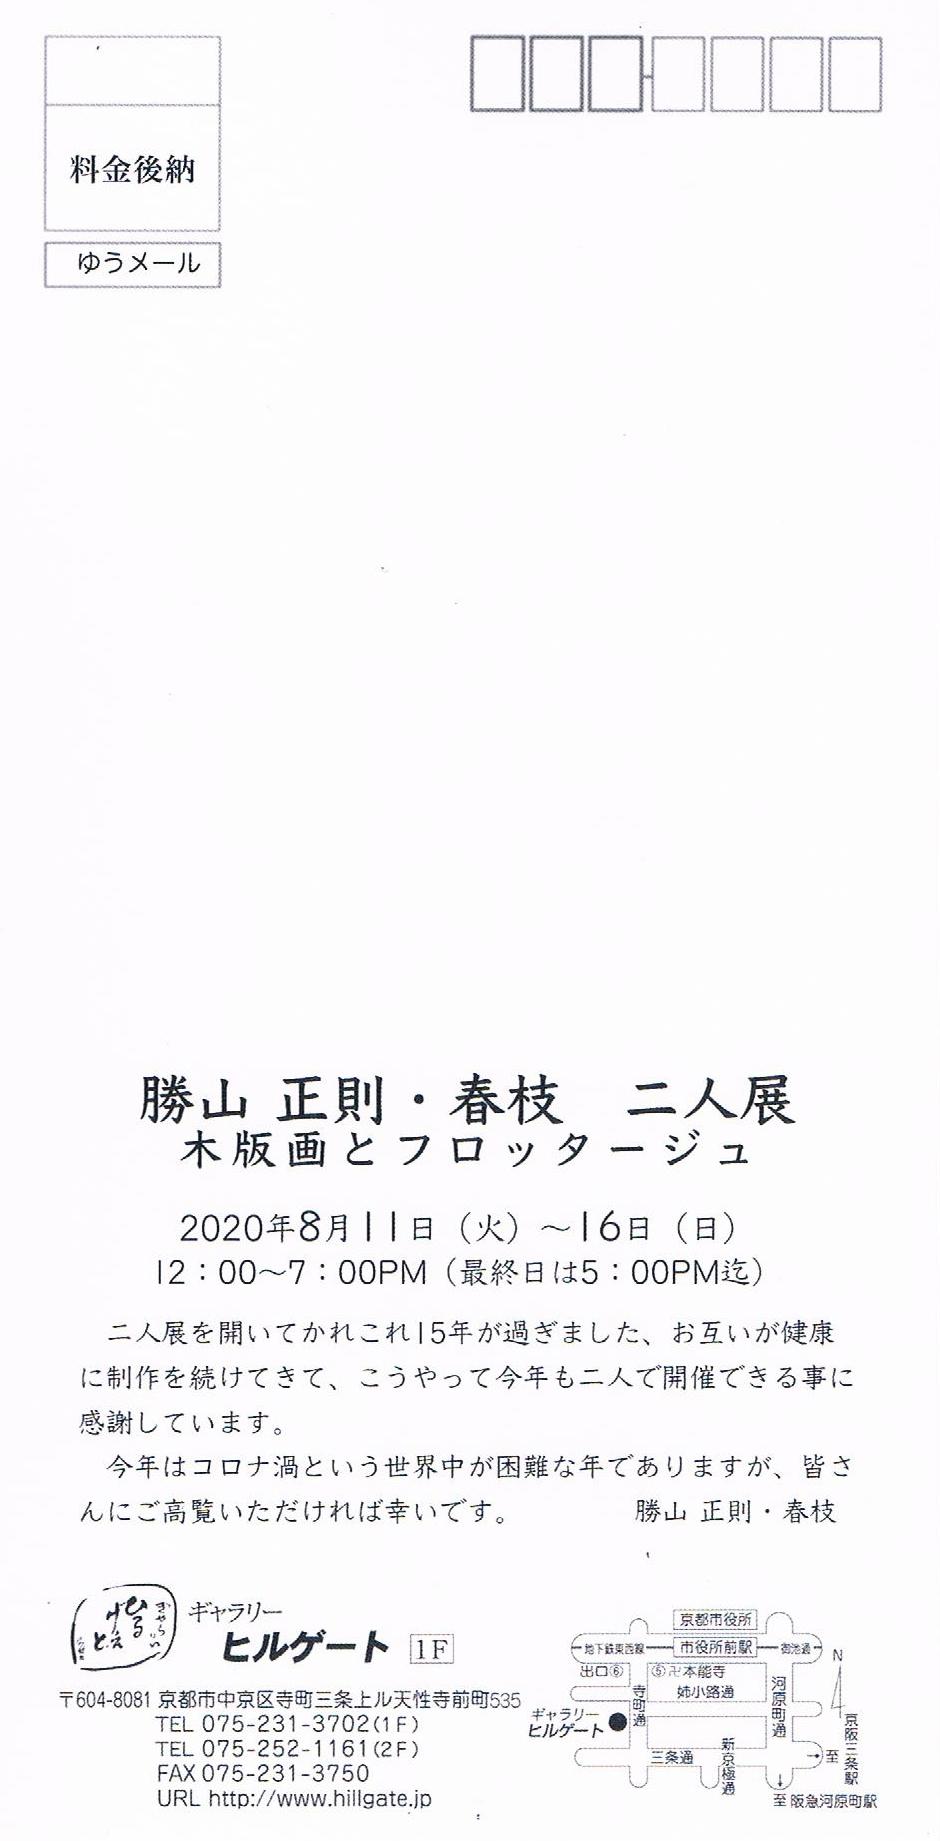 20200710171808e83.jpg